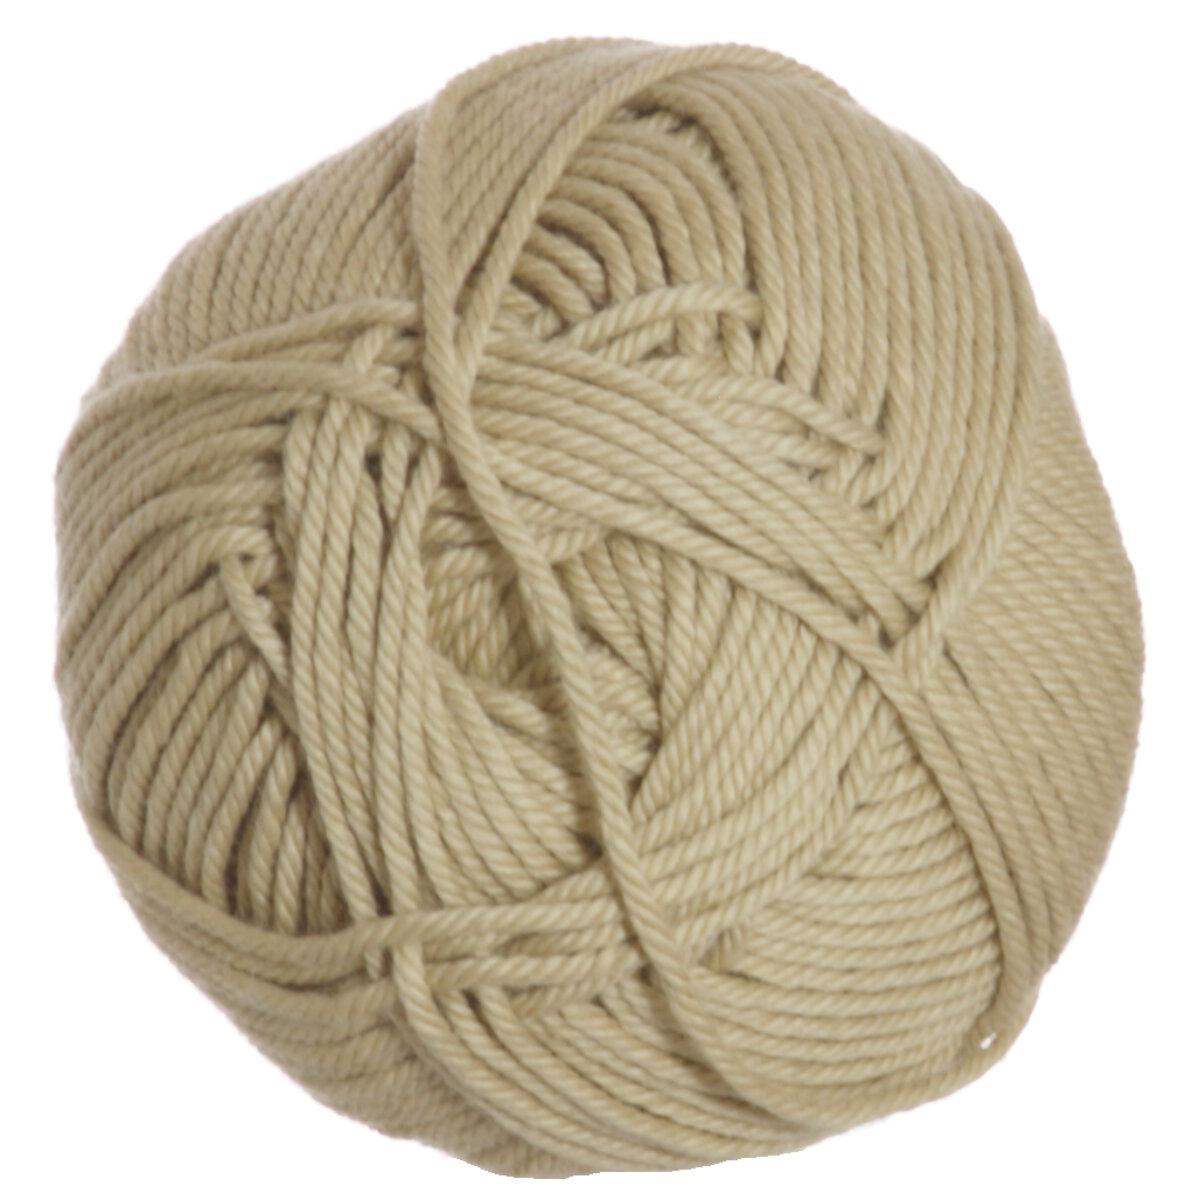 Rowan Handknit Cotton Yarn - 205 Linen at Jimmy Beans Wool